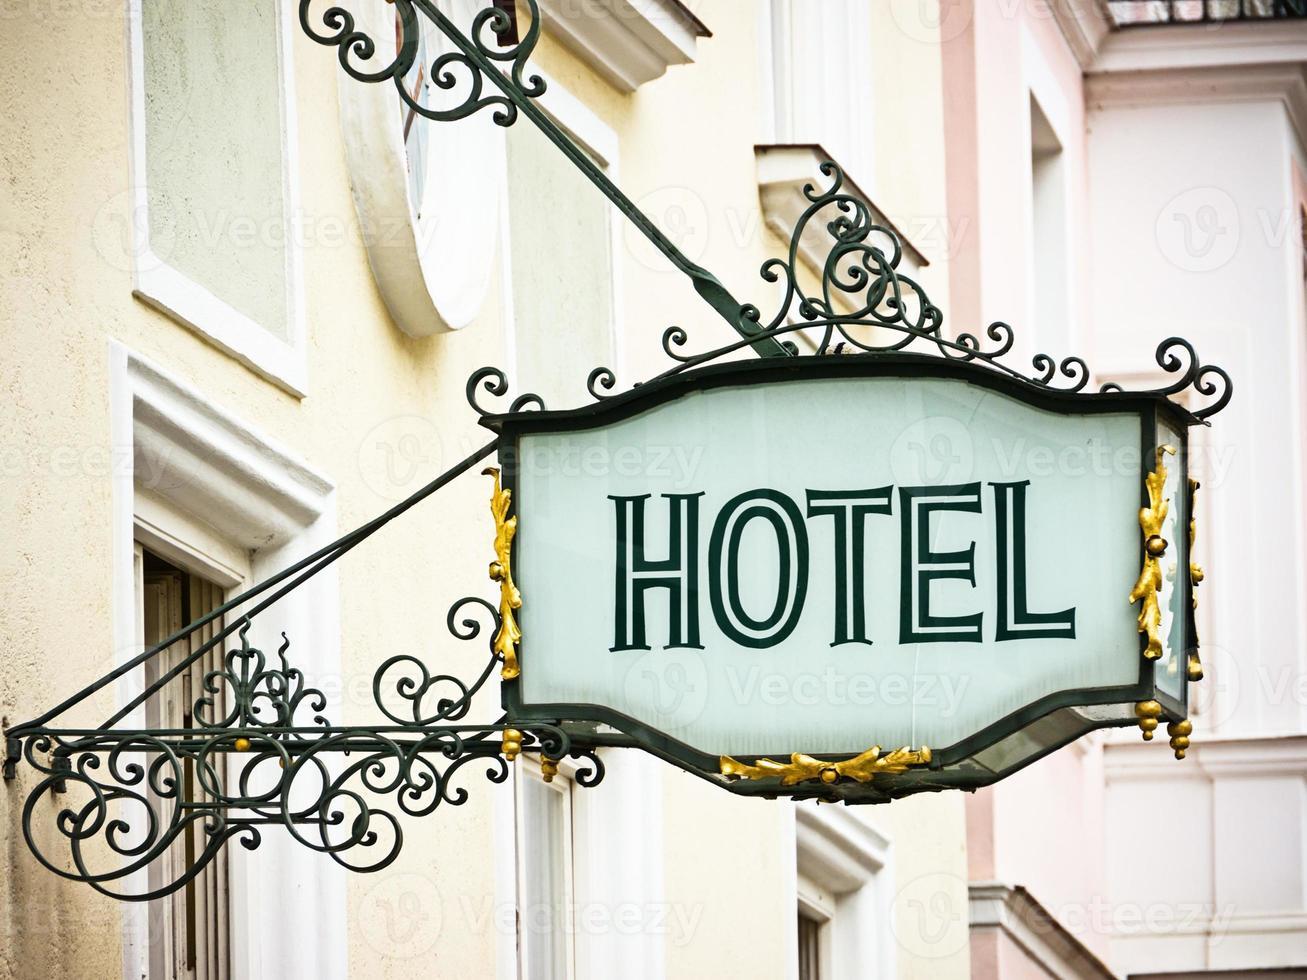 hotel sign photo